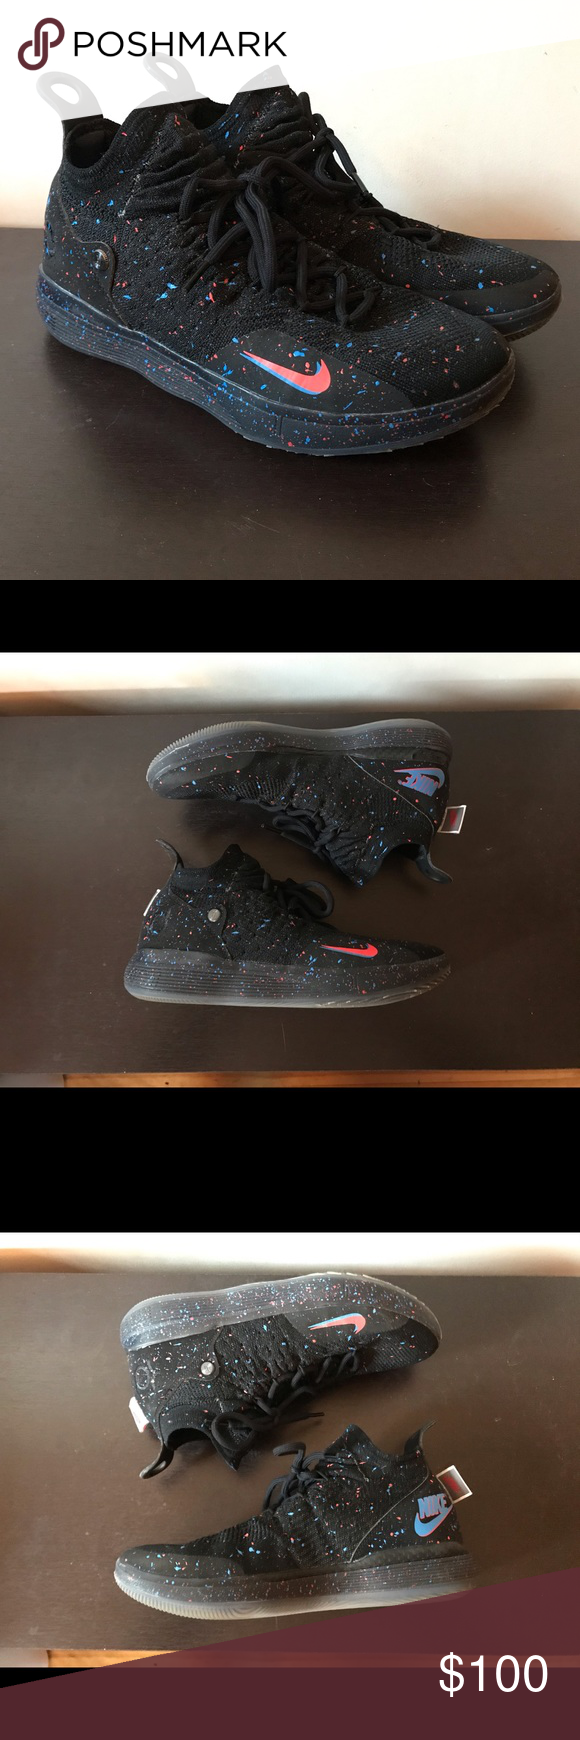 "Nike KD 11 Low ""Confetti"" size 8.5"